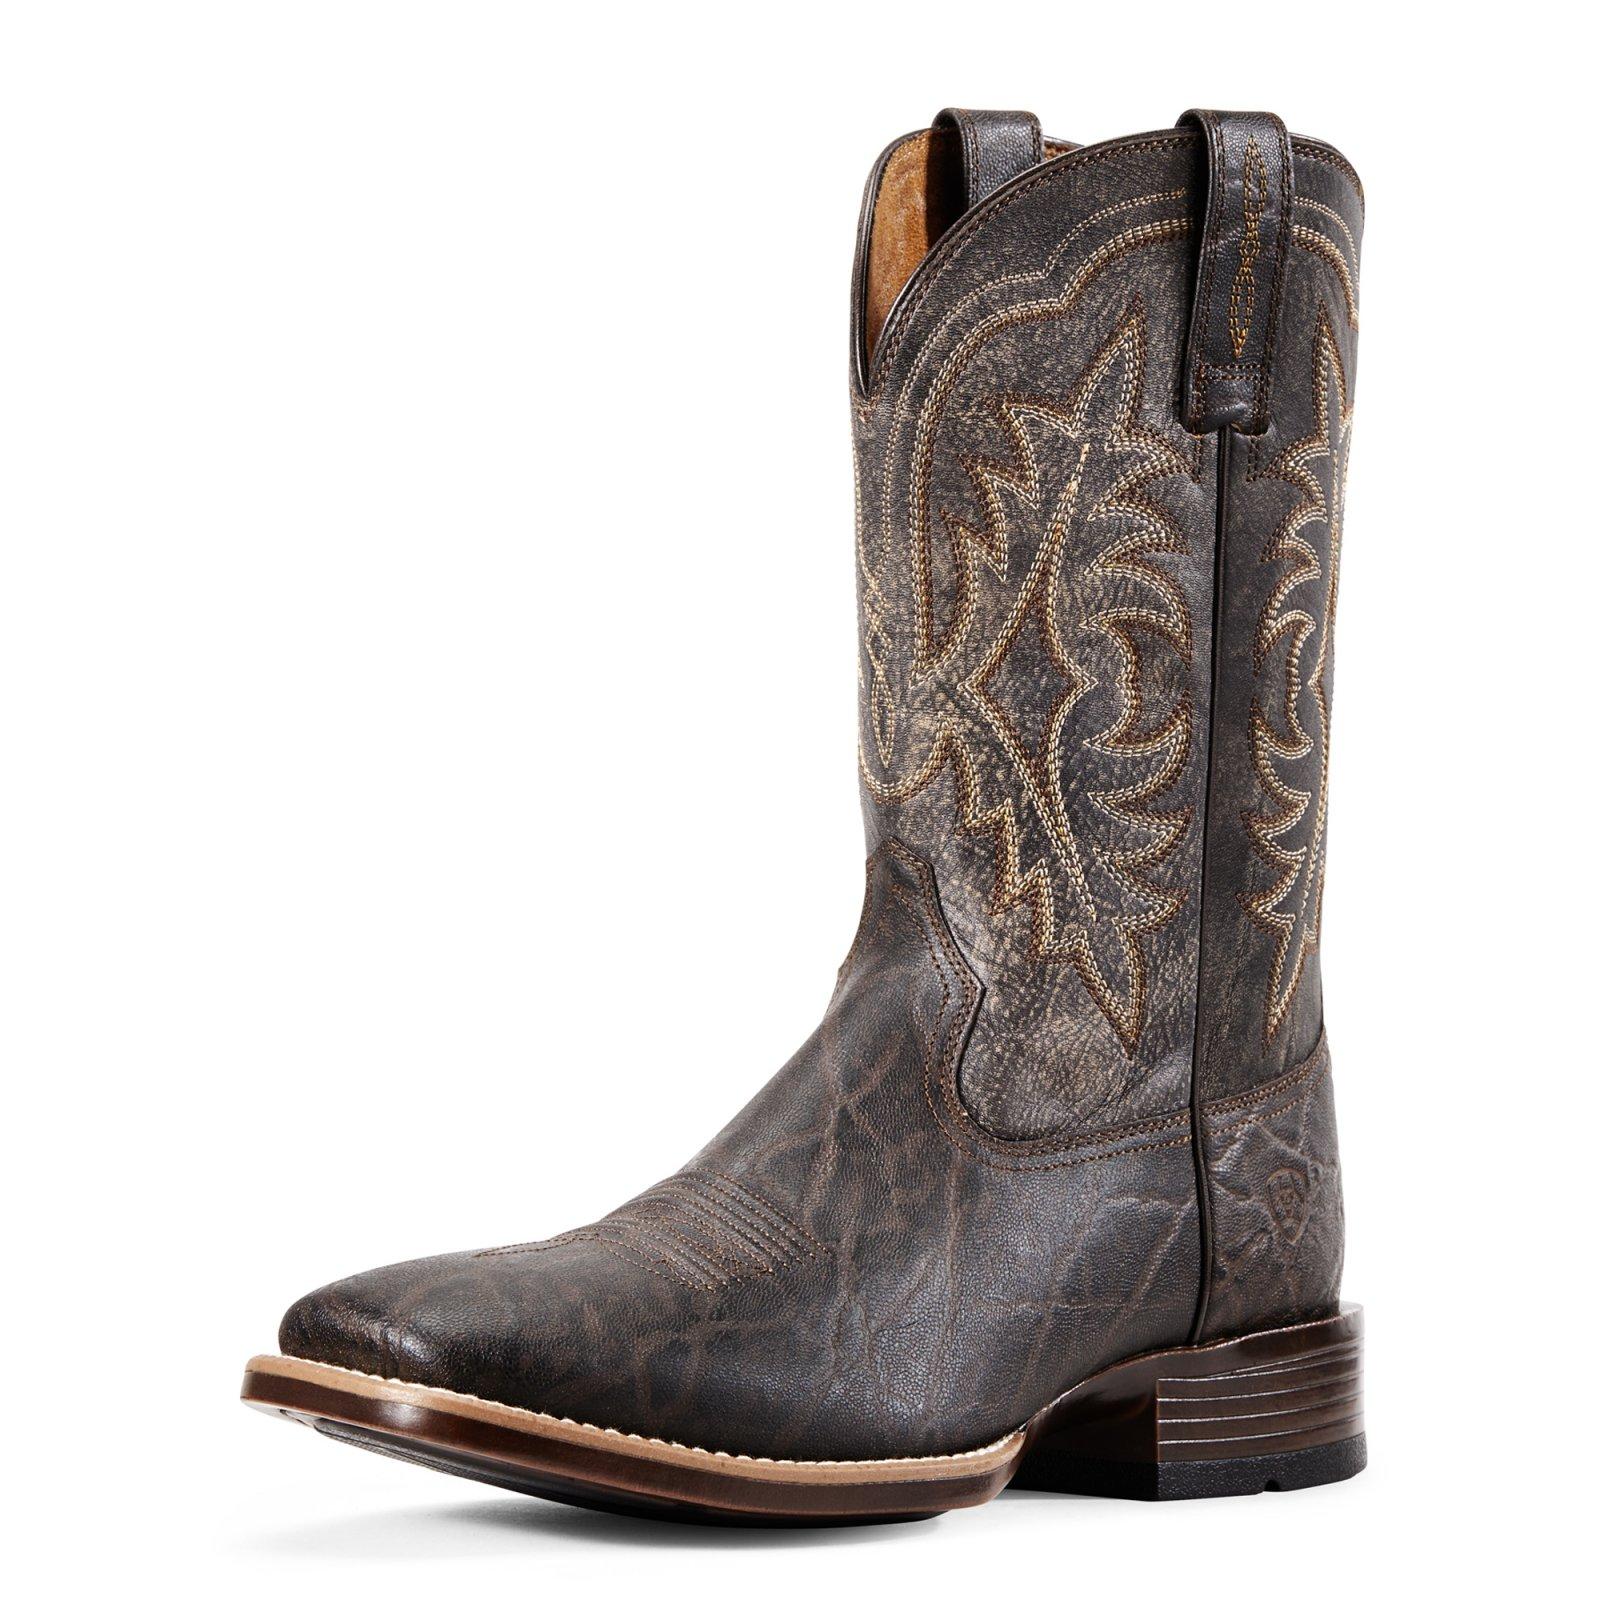 Ryden Boot from Ariat